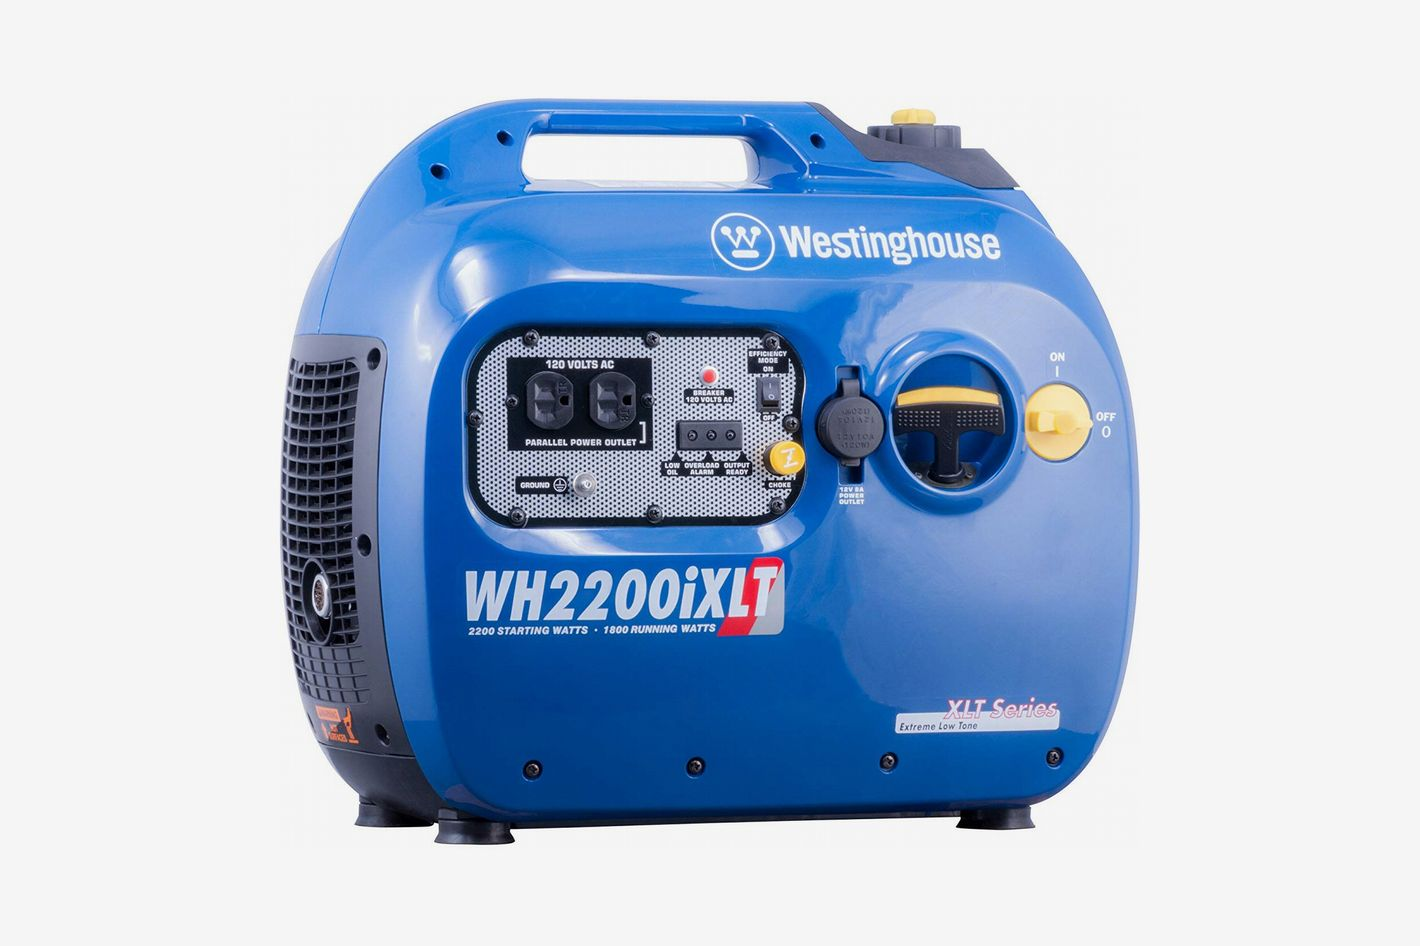 Westinghouse WH2200iXLT Super Quiet Portable Inverter Generator